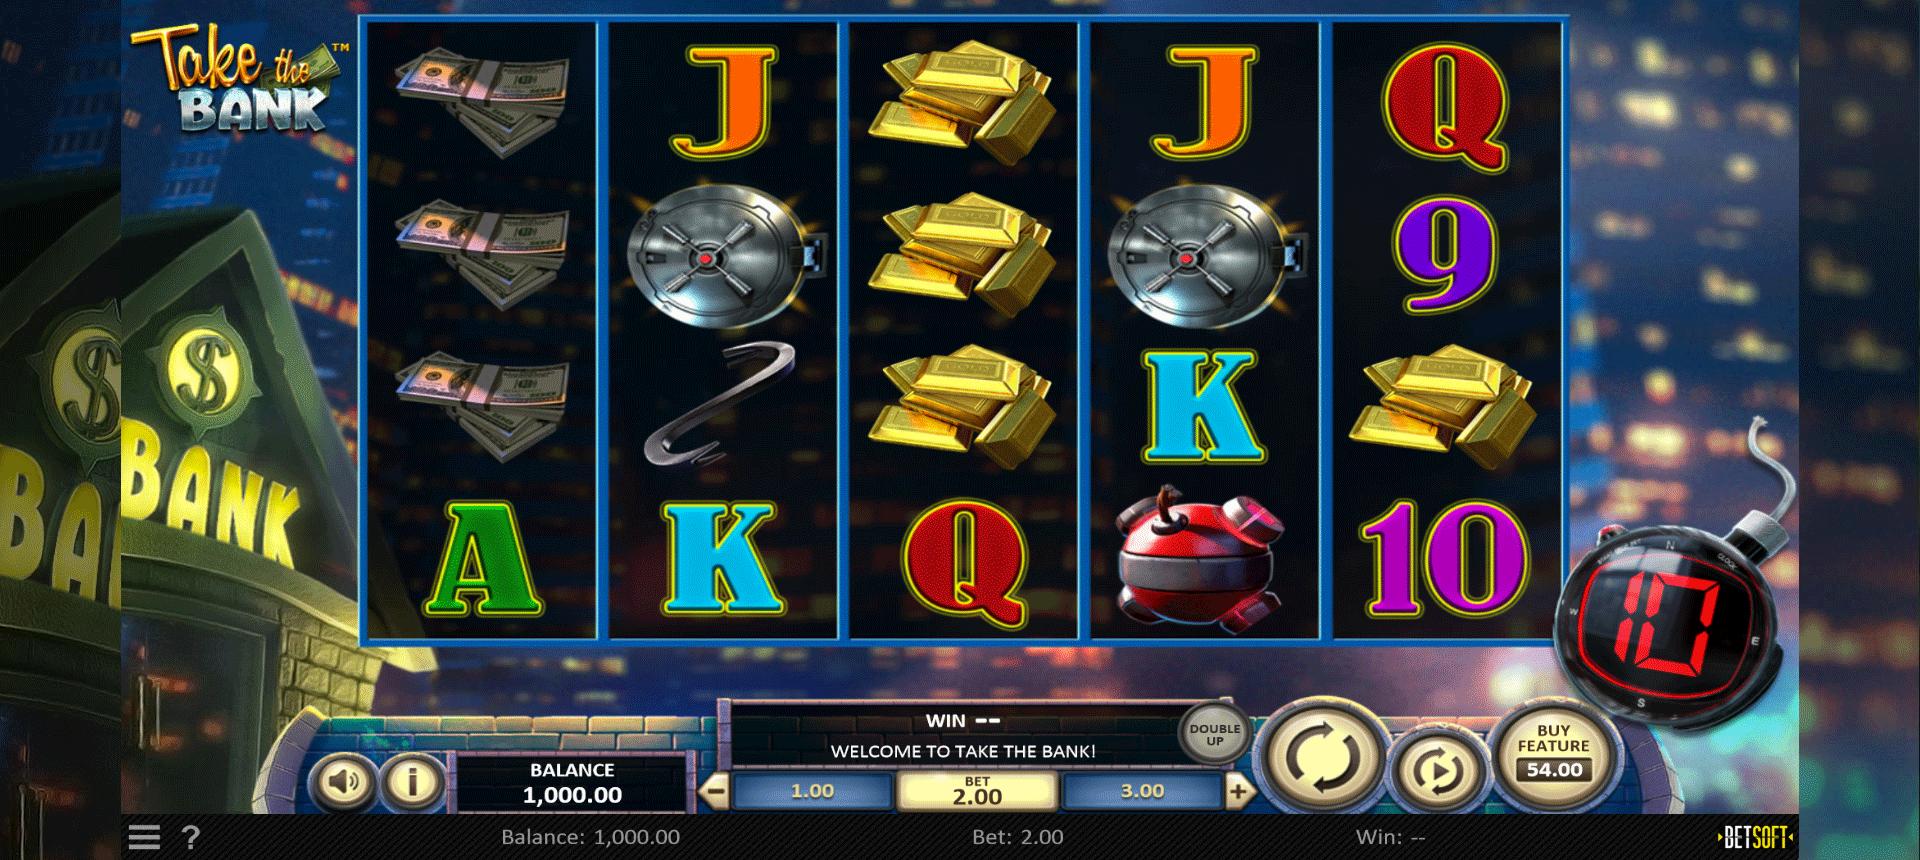 Slot Take the Bank